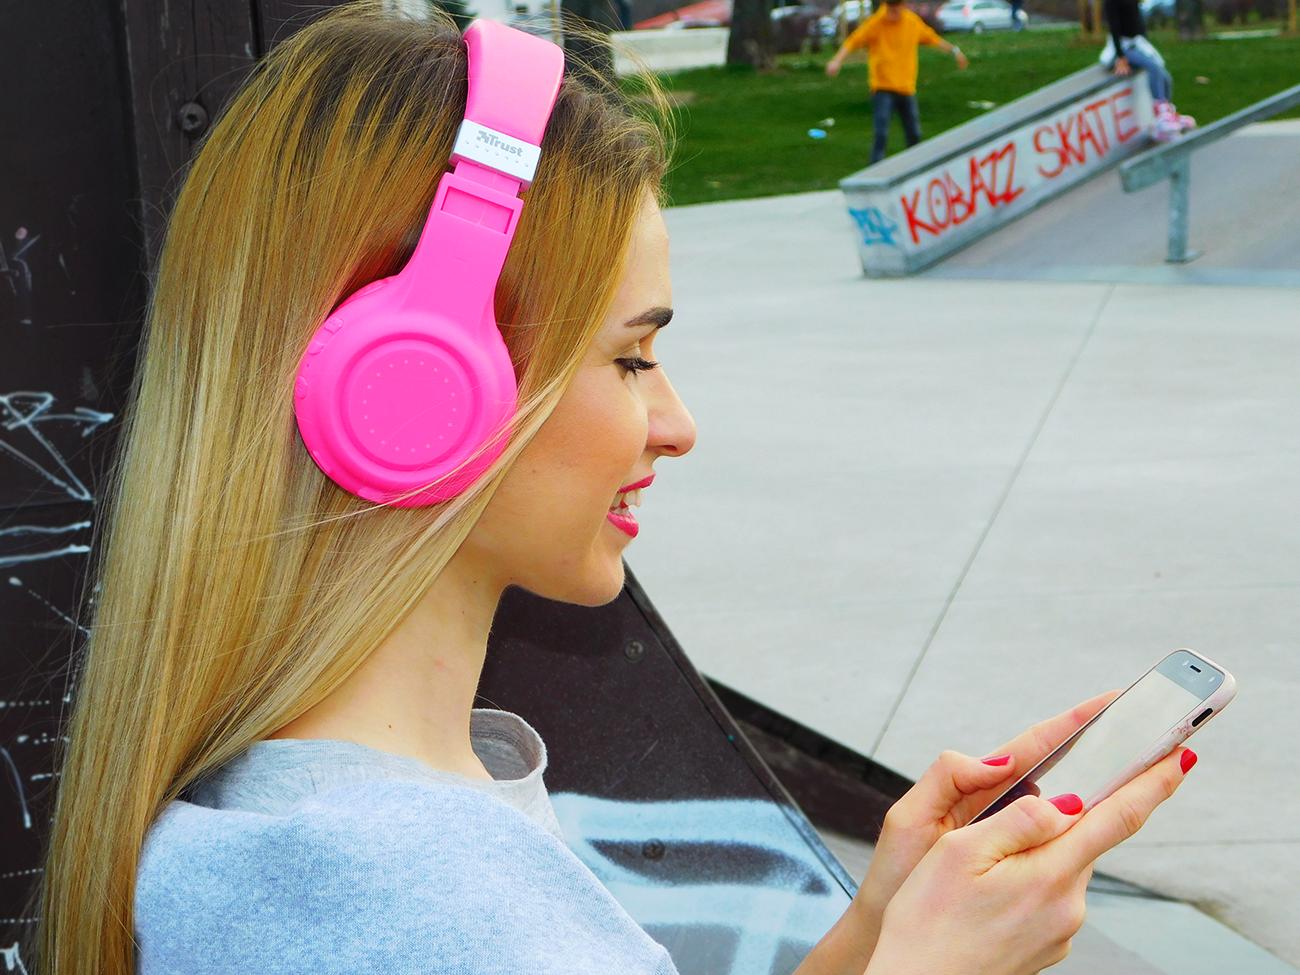 A girl using Soly lyrics app